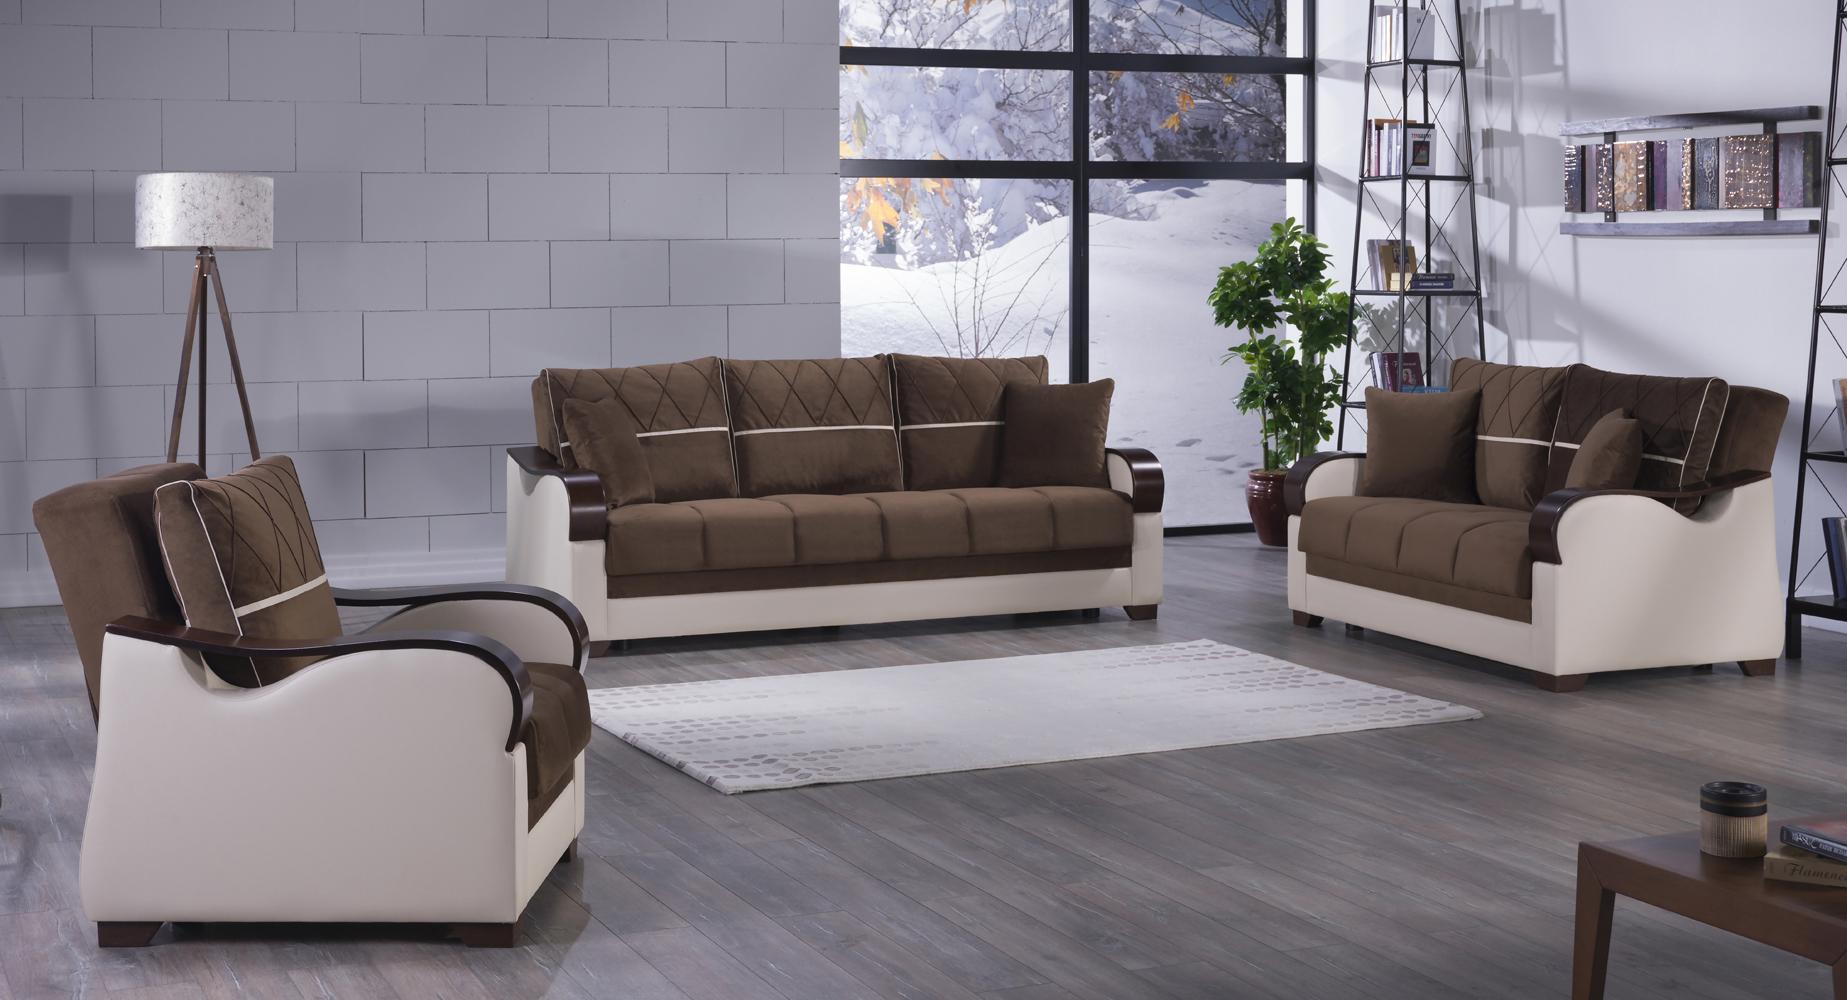 Bennett Best Brown Sofa, Love U0026 Chair Set By Istikbal (Sunset) (Istikbal